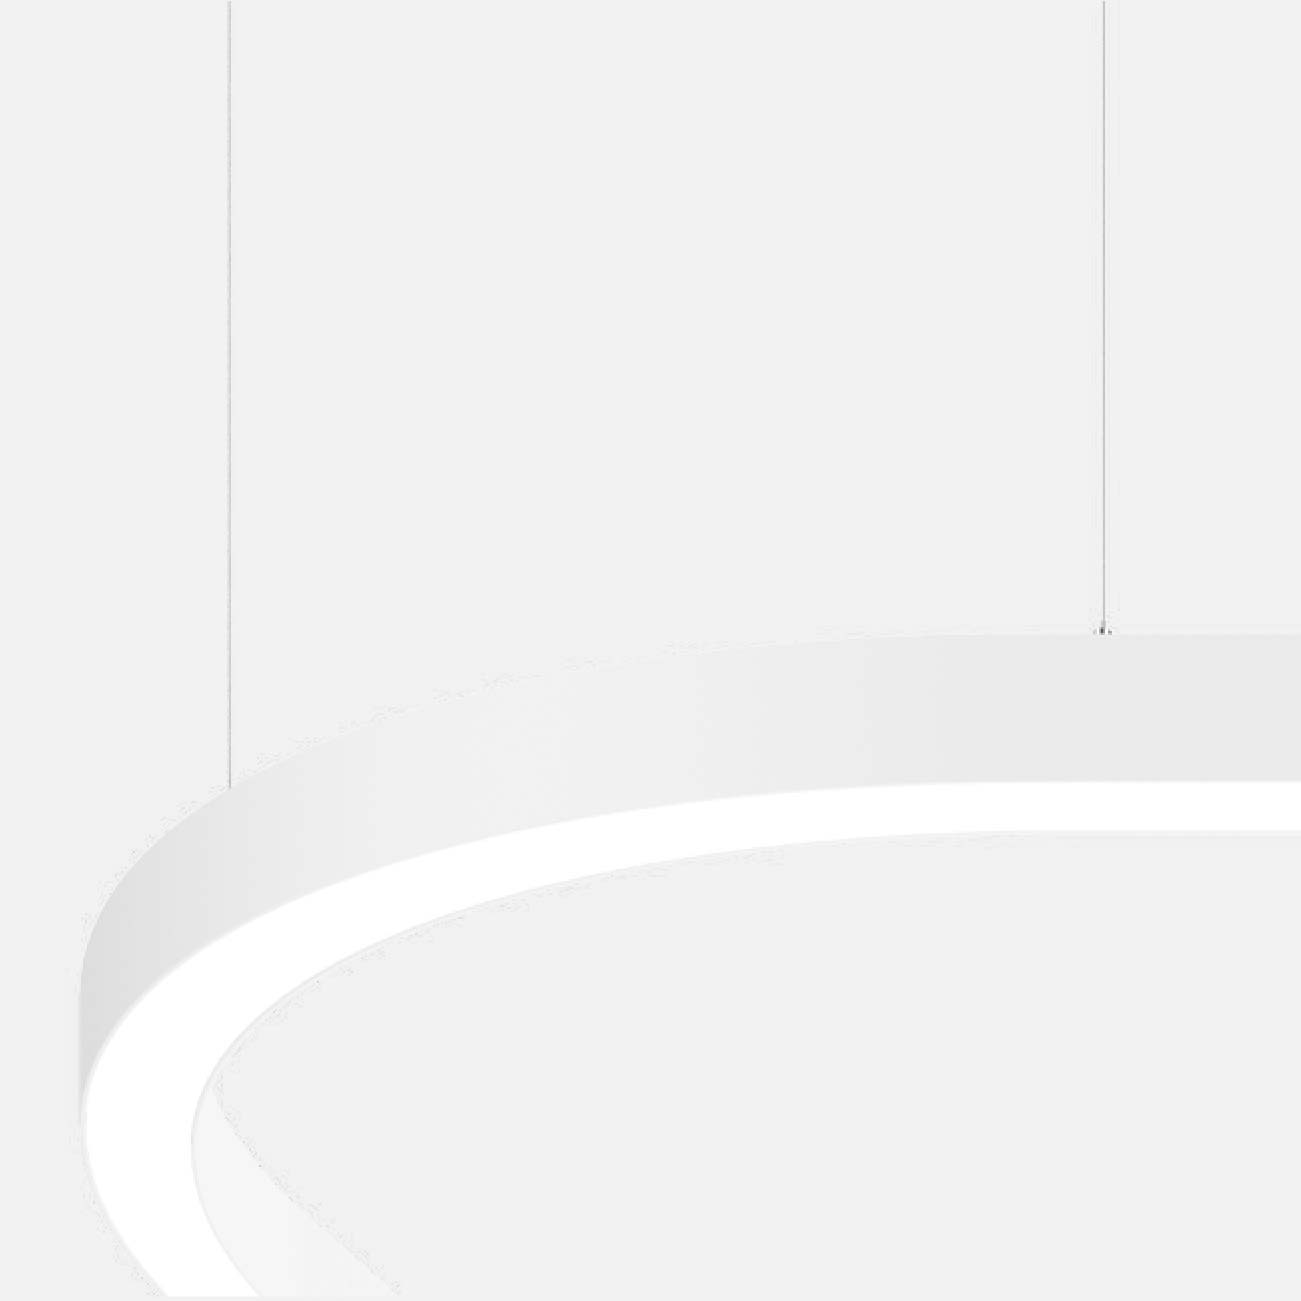 Mino 60 curve 01